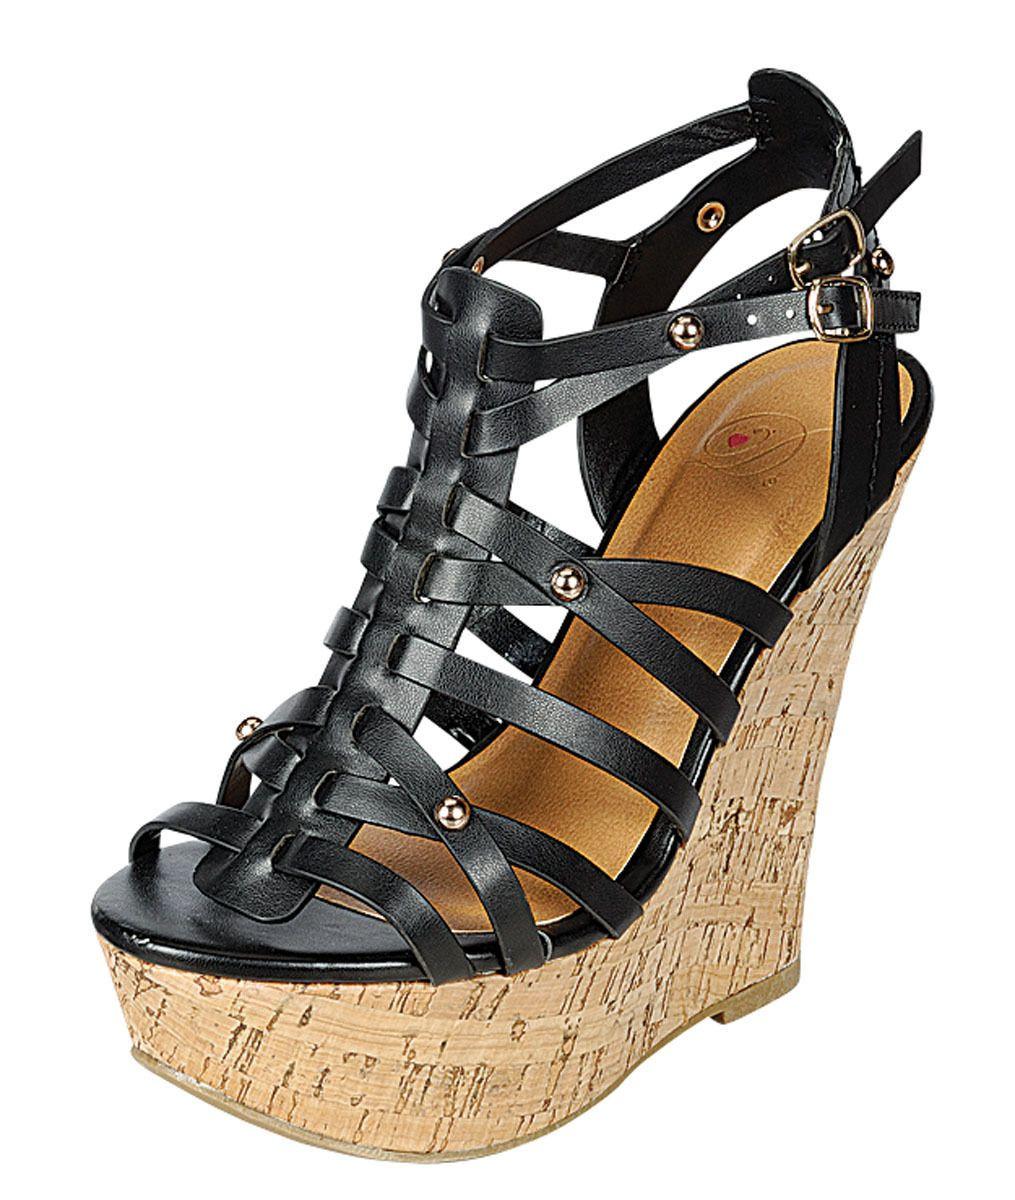 aa70cebdbdd Womens Cork Wedge Sandals Platform Heel Strappy Ankle Wrap Comfy ...